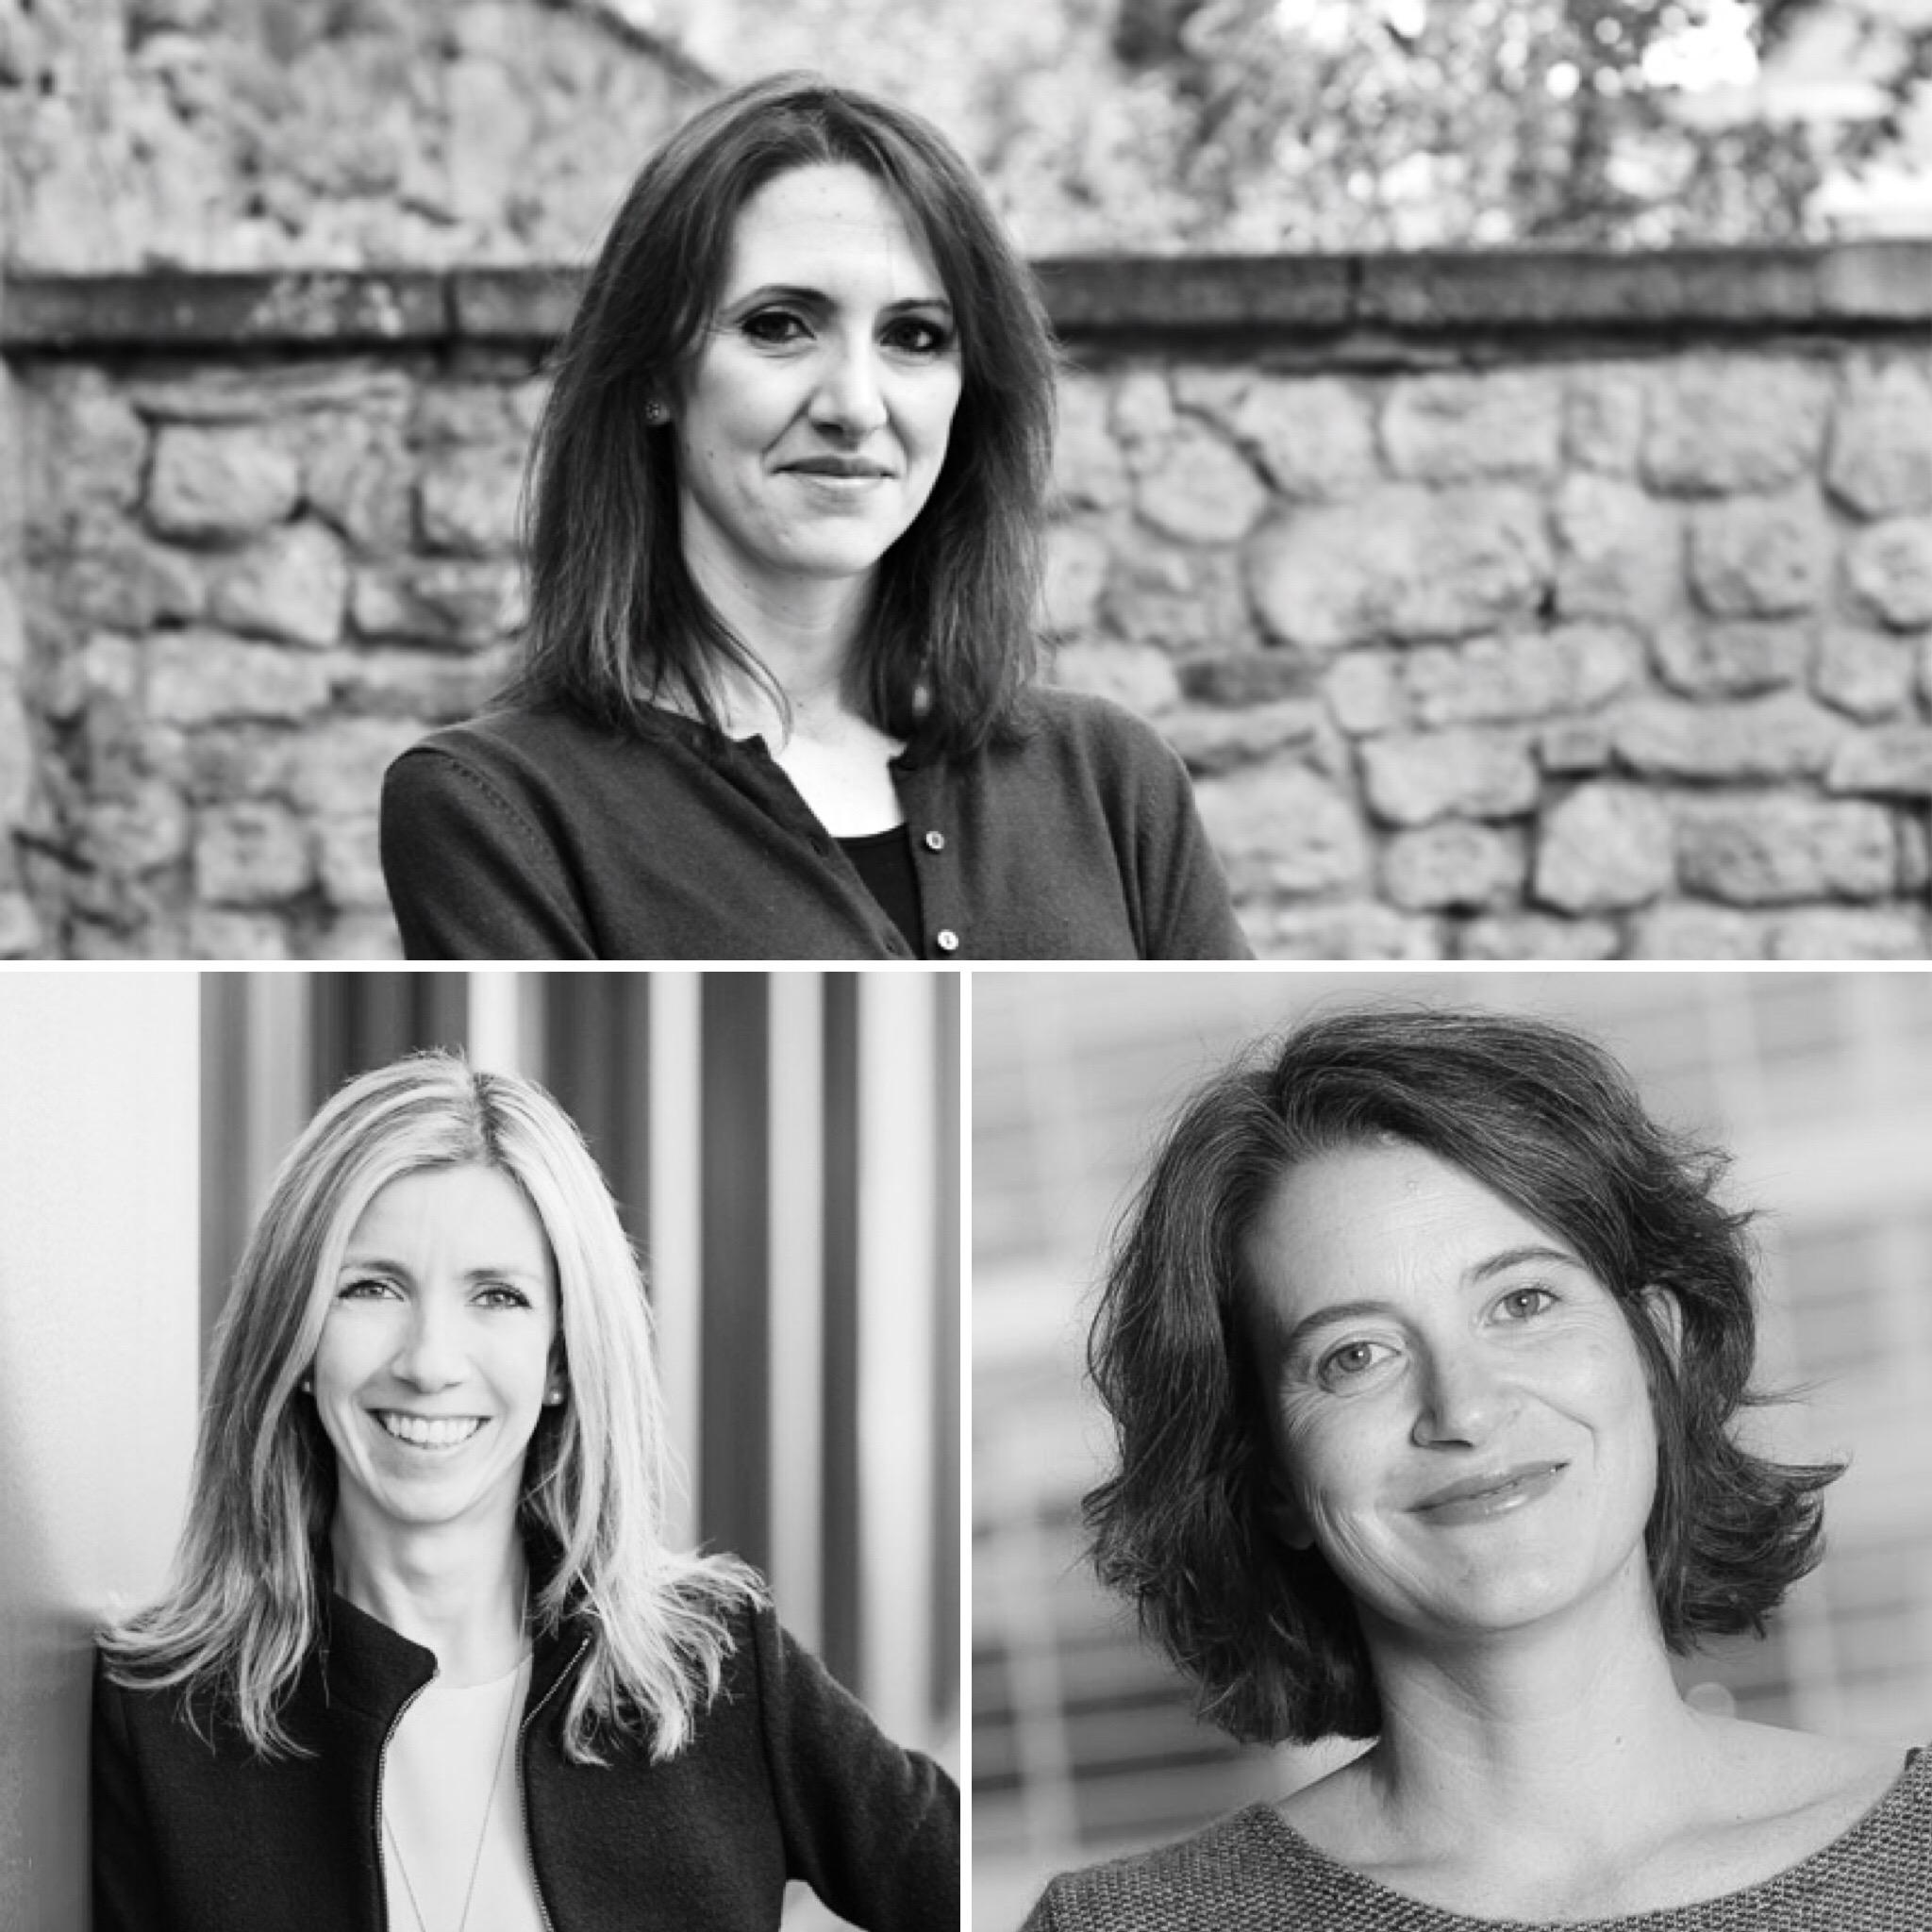 Clockwise, Mariarosaria Taddeo, Riccarda Zezza, Manuela Andaloro